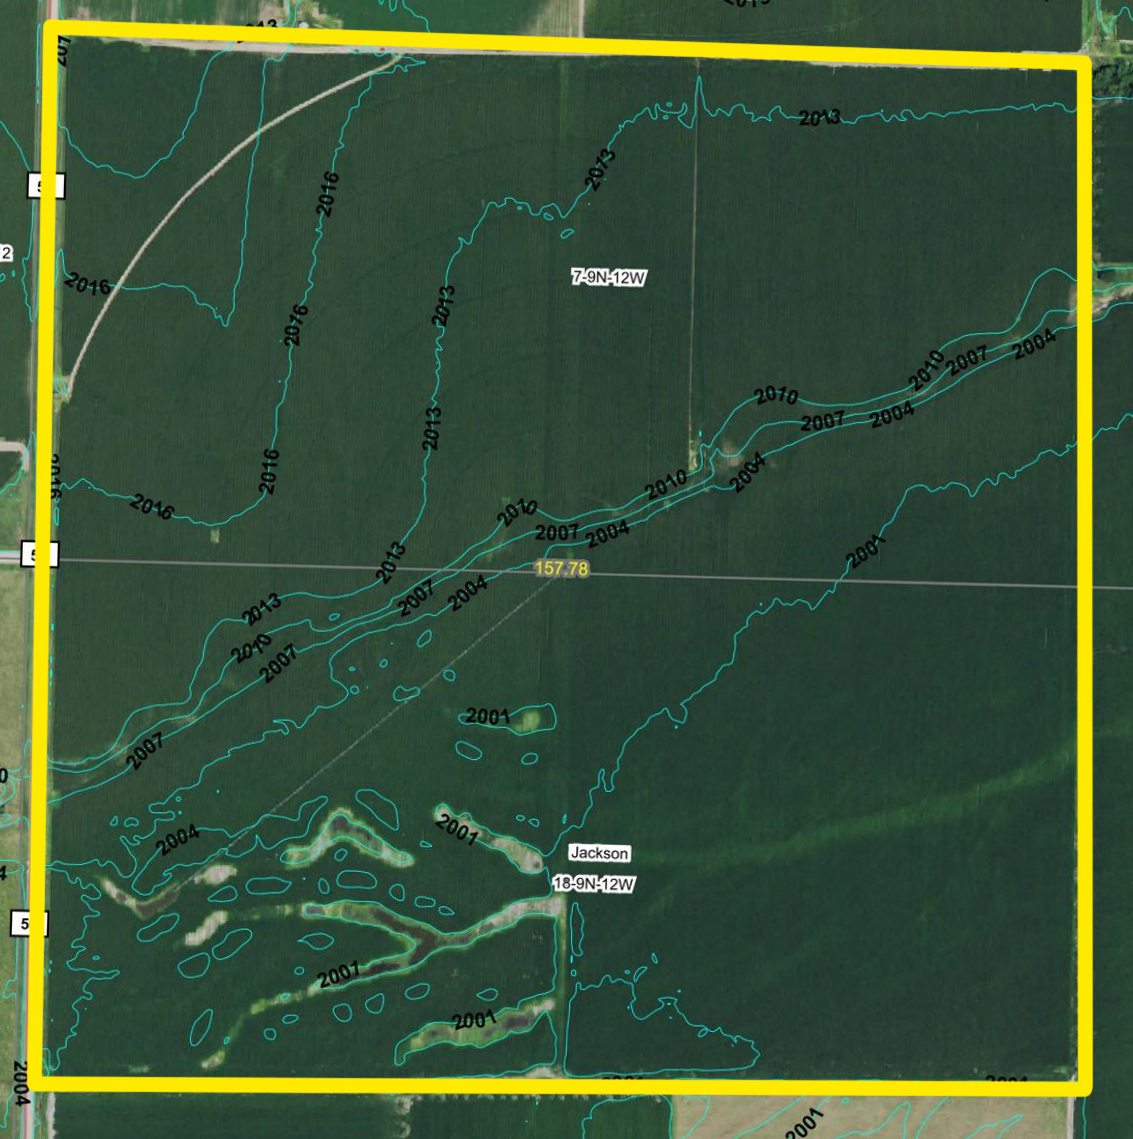 Topography Contours1 BIR98